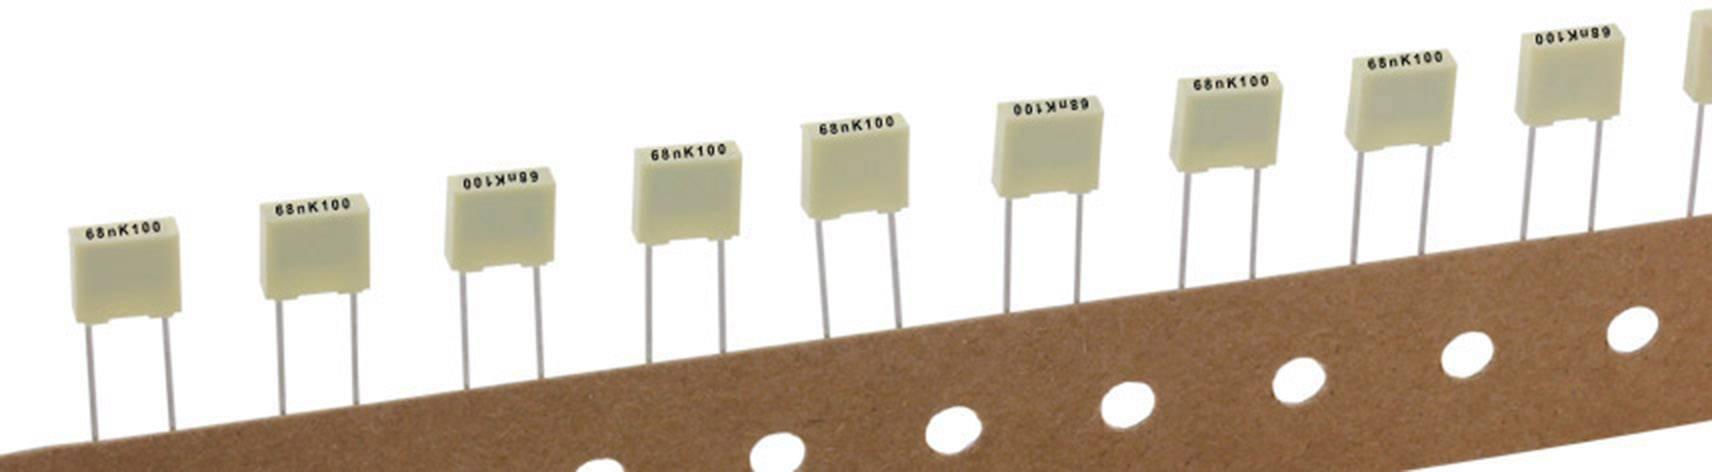 Polyesterový kondenzátor Kemet R82EC1330DQ50K+ radiální, 3.3 nF, 100 V,10 %, 5 mm, (d x š x v) 7.2 x 2.5 mm x 6.5 mm, 1 ks